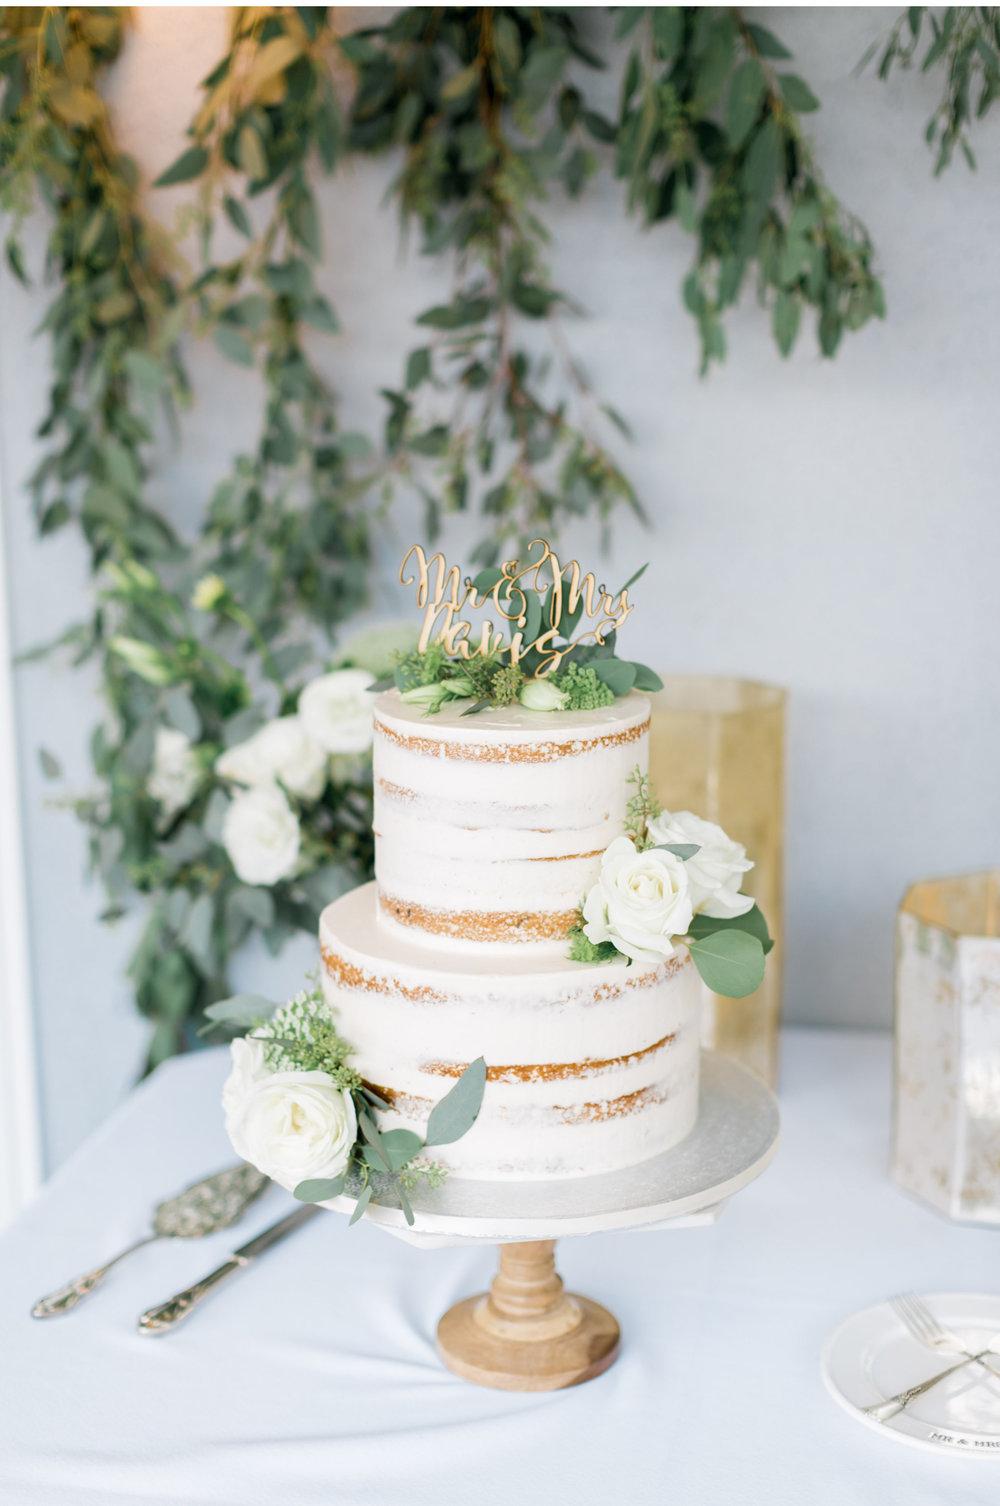 Malibu-Wedding-Photographer-Natalie-Schutt-Photography-Fine-Art-Film-Photography_07.jpg